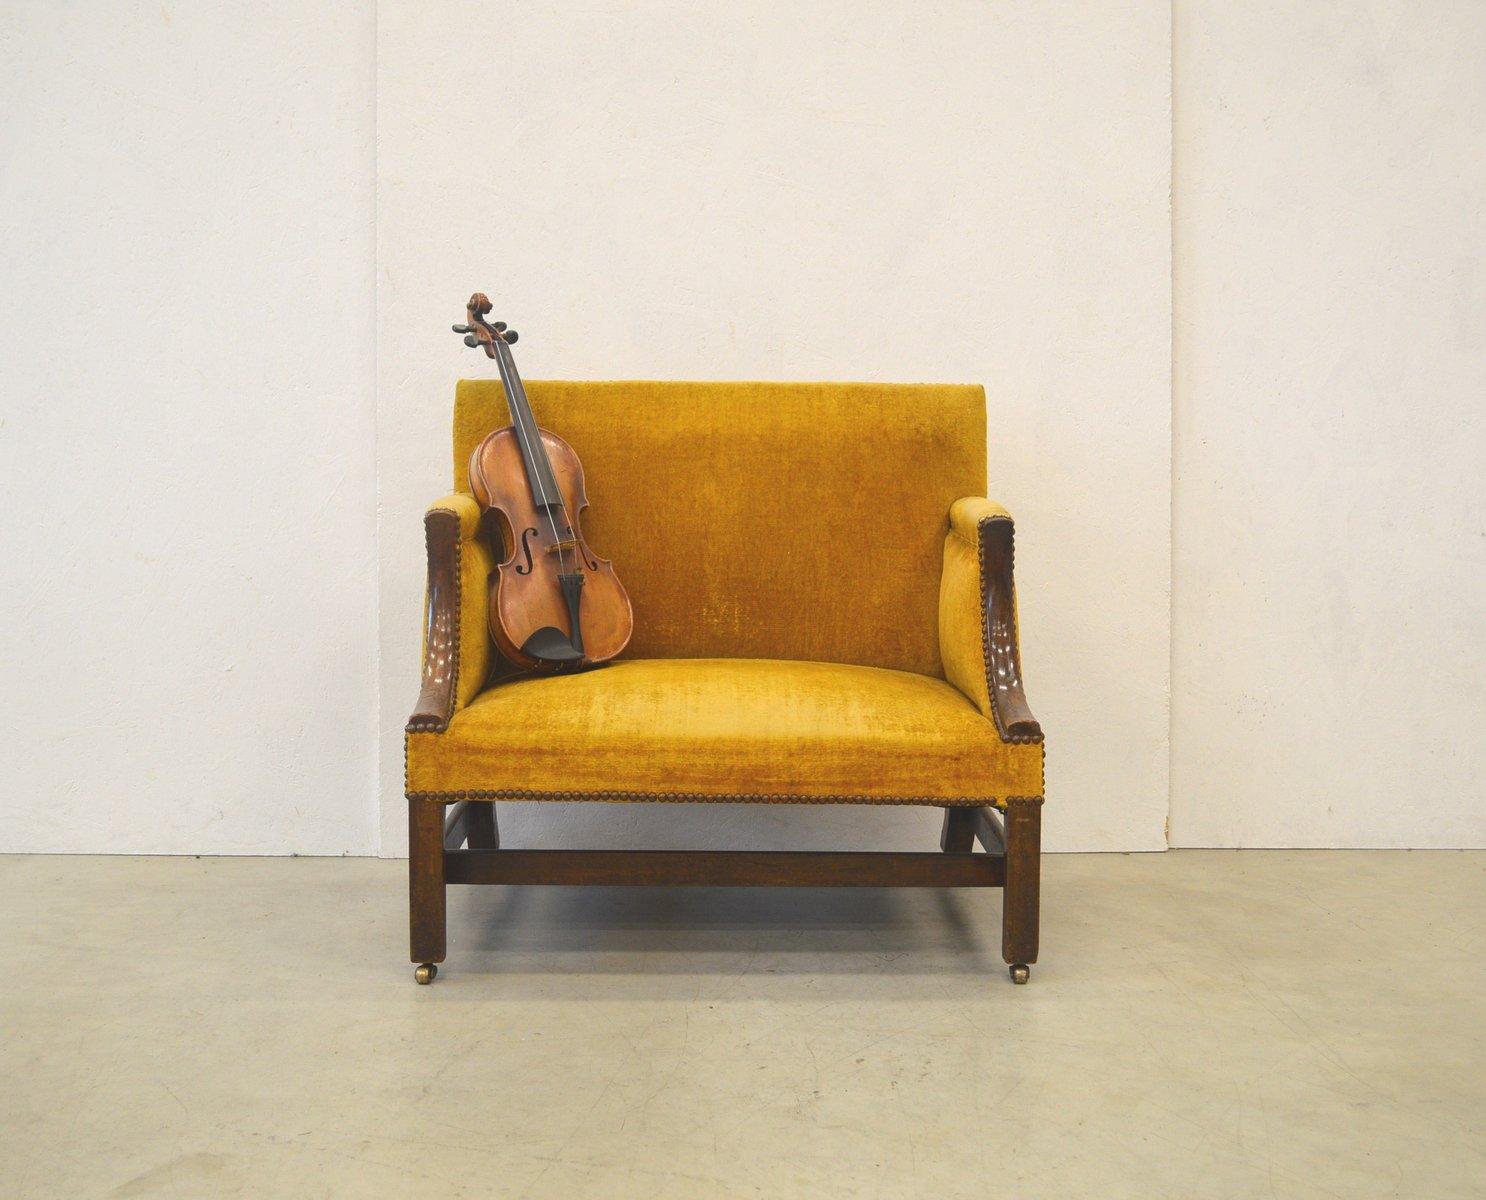 englisches georg iii kindersofa 1790 bei pamono kaufen. Black Bedroom Furniture Sets. Home Design Ideas